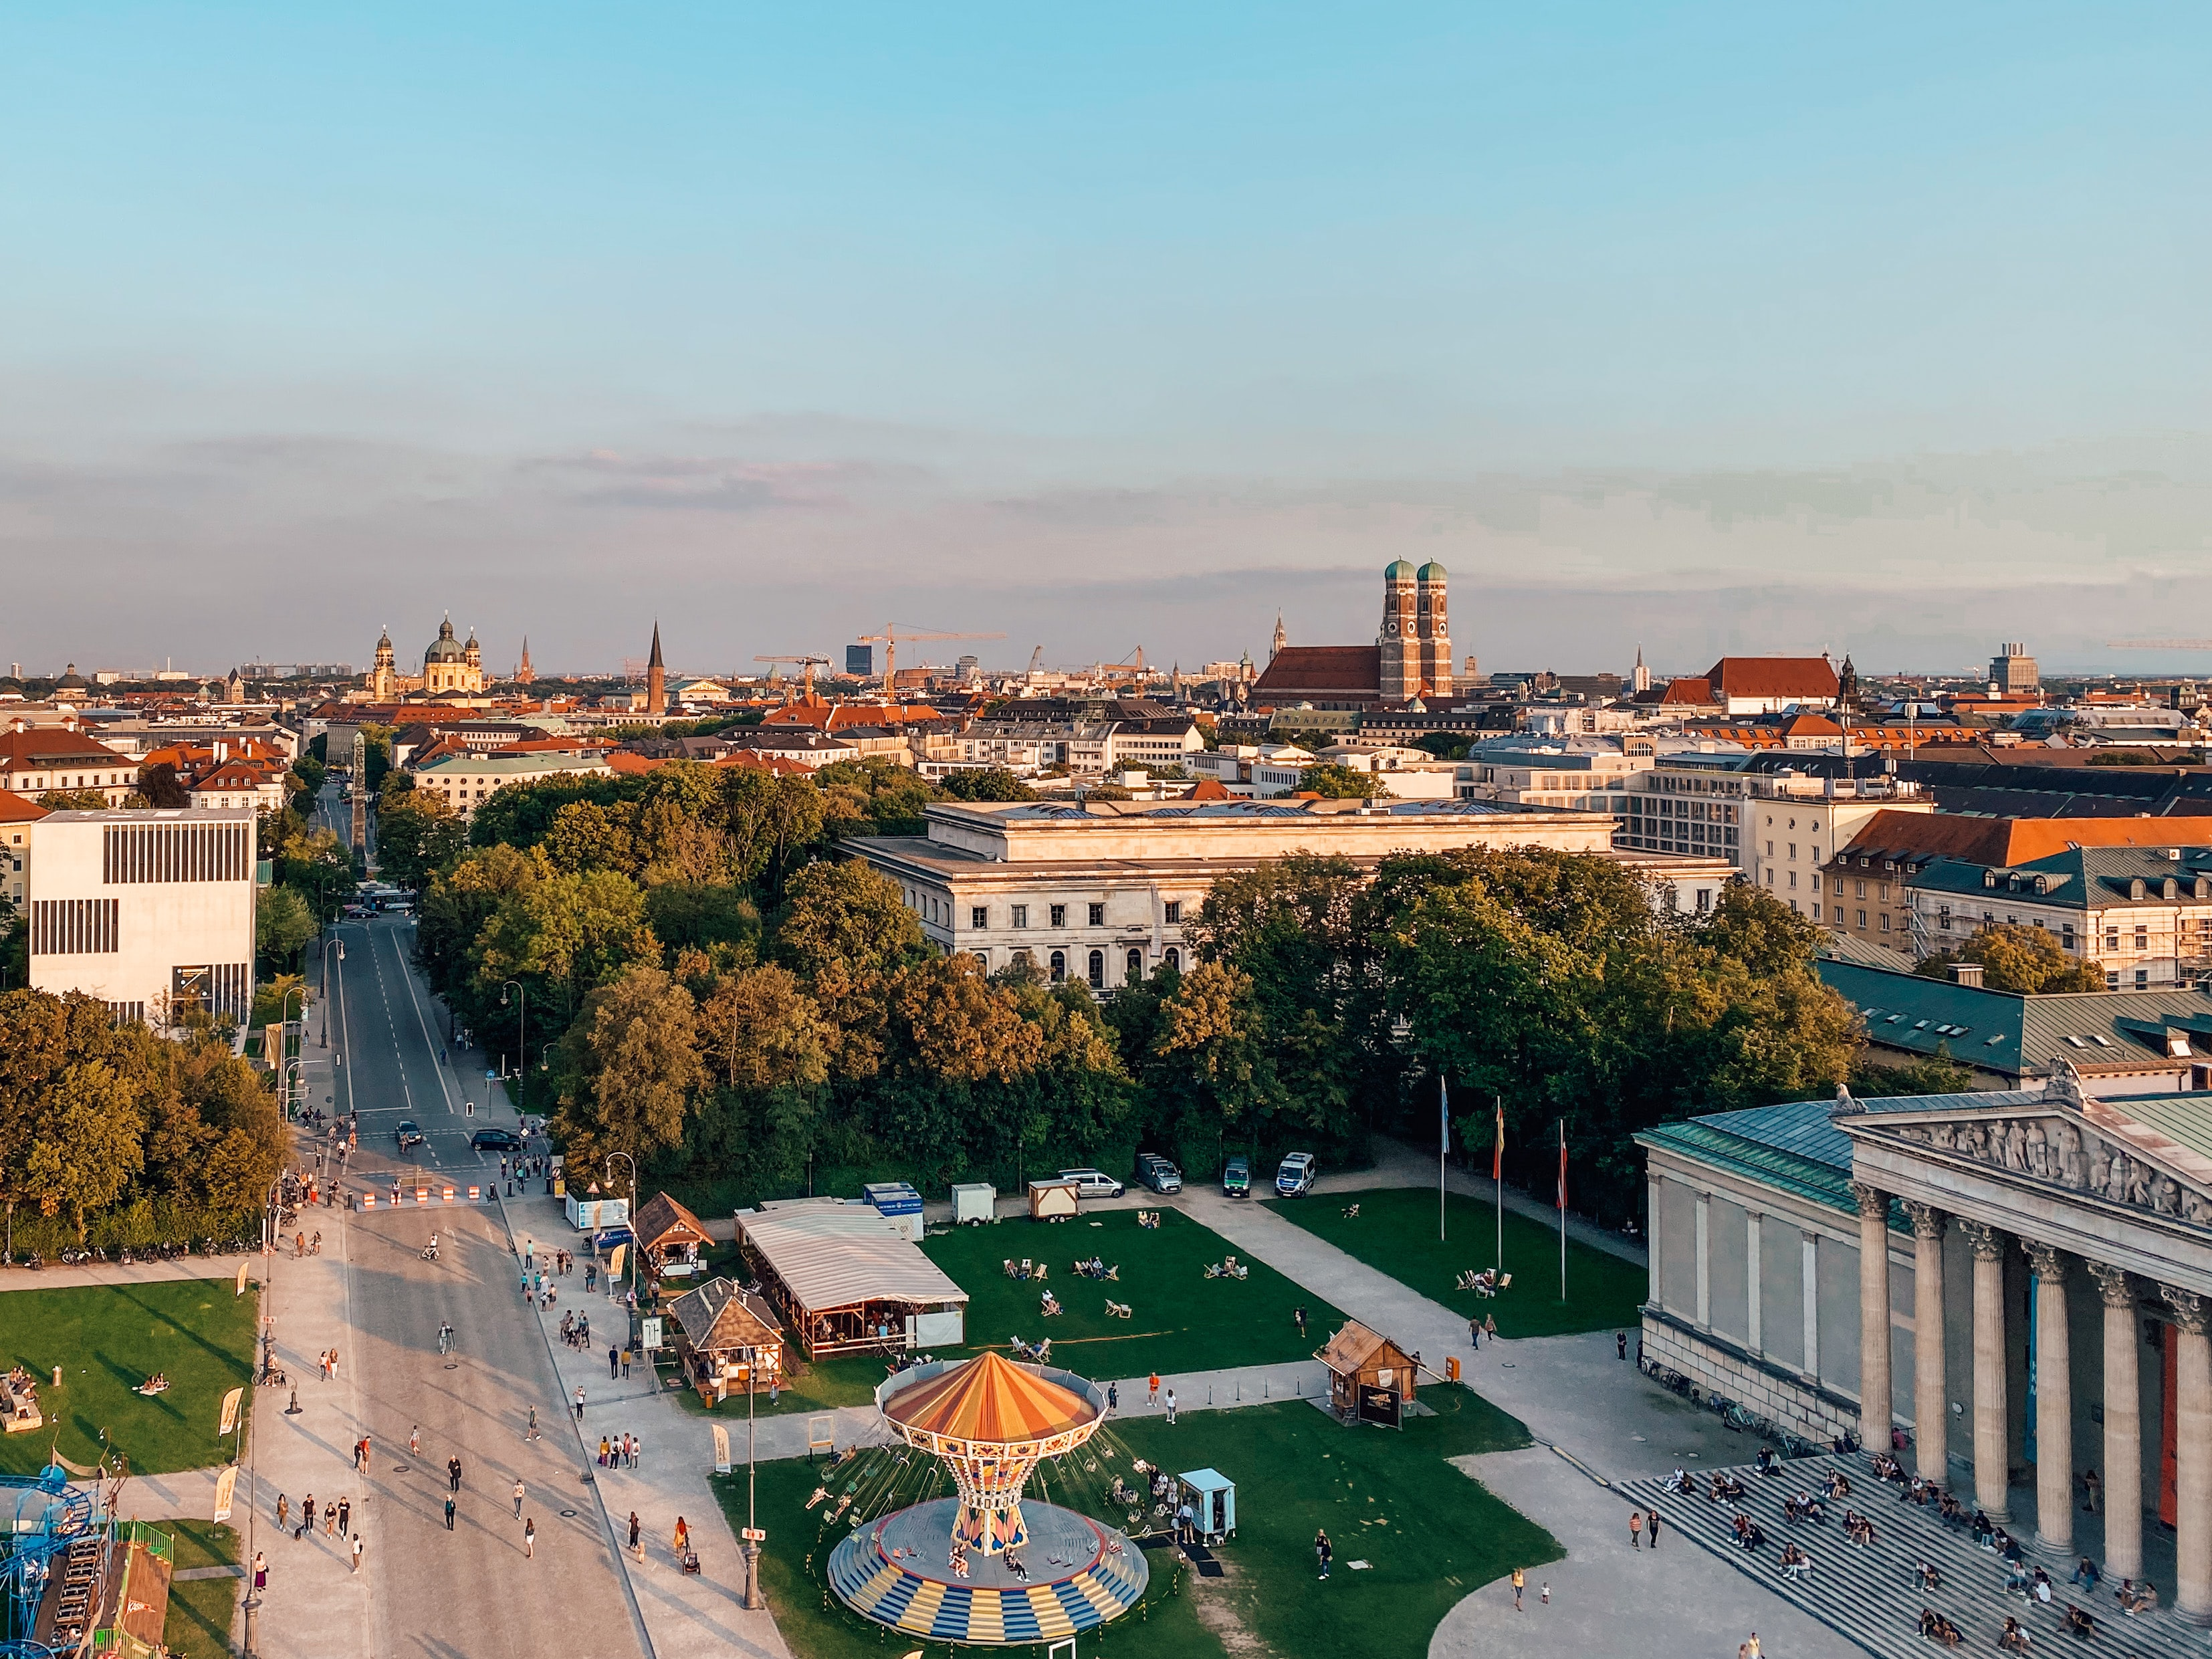 Munich Photo by Jan Antonin Kolar